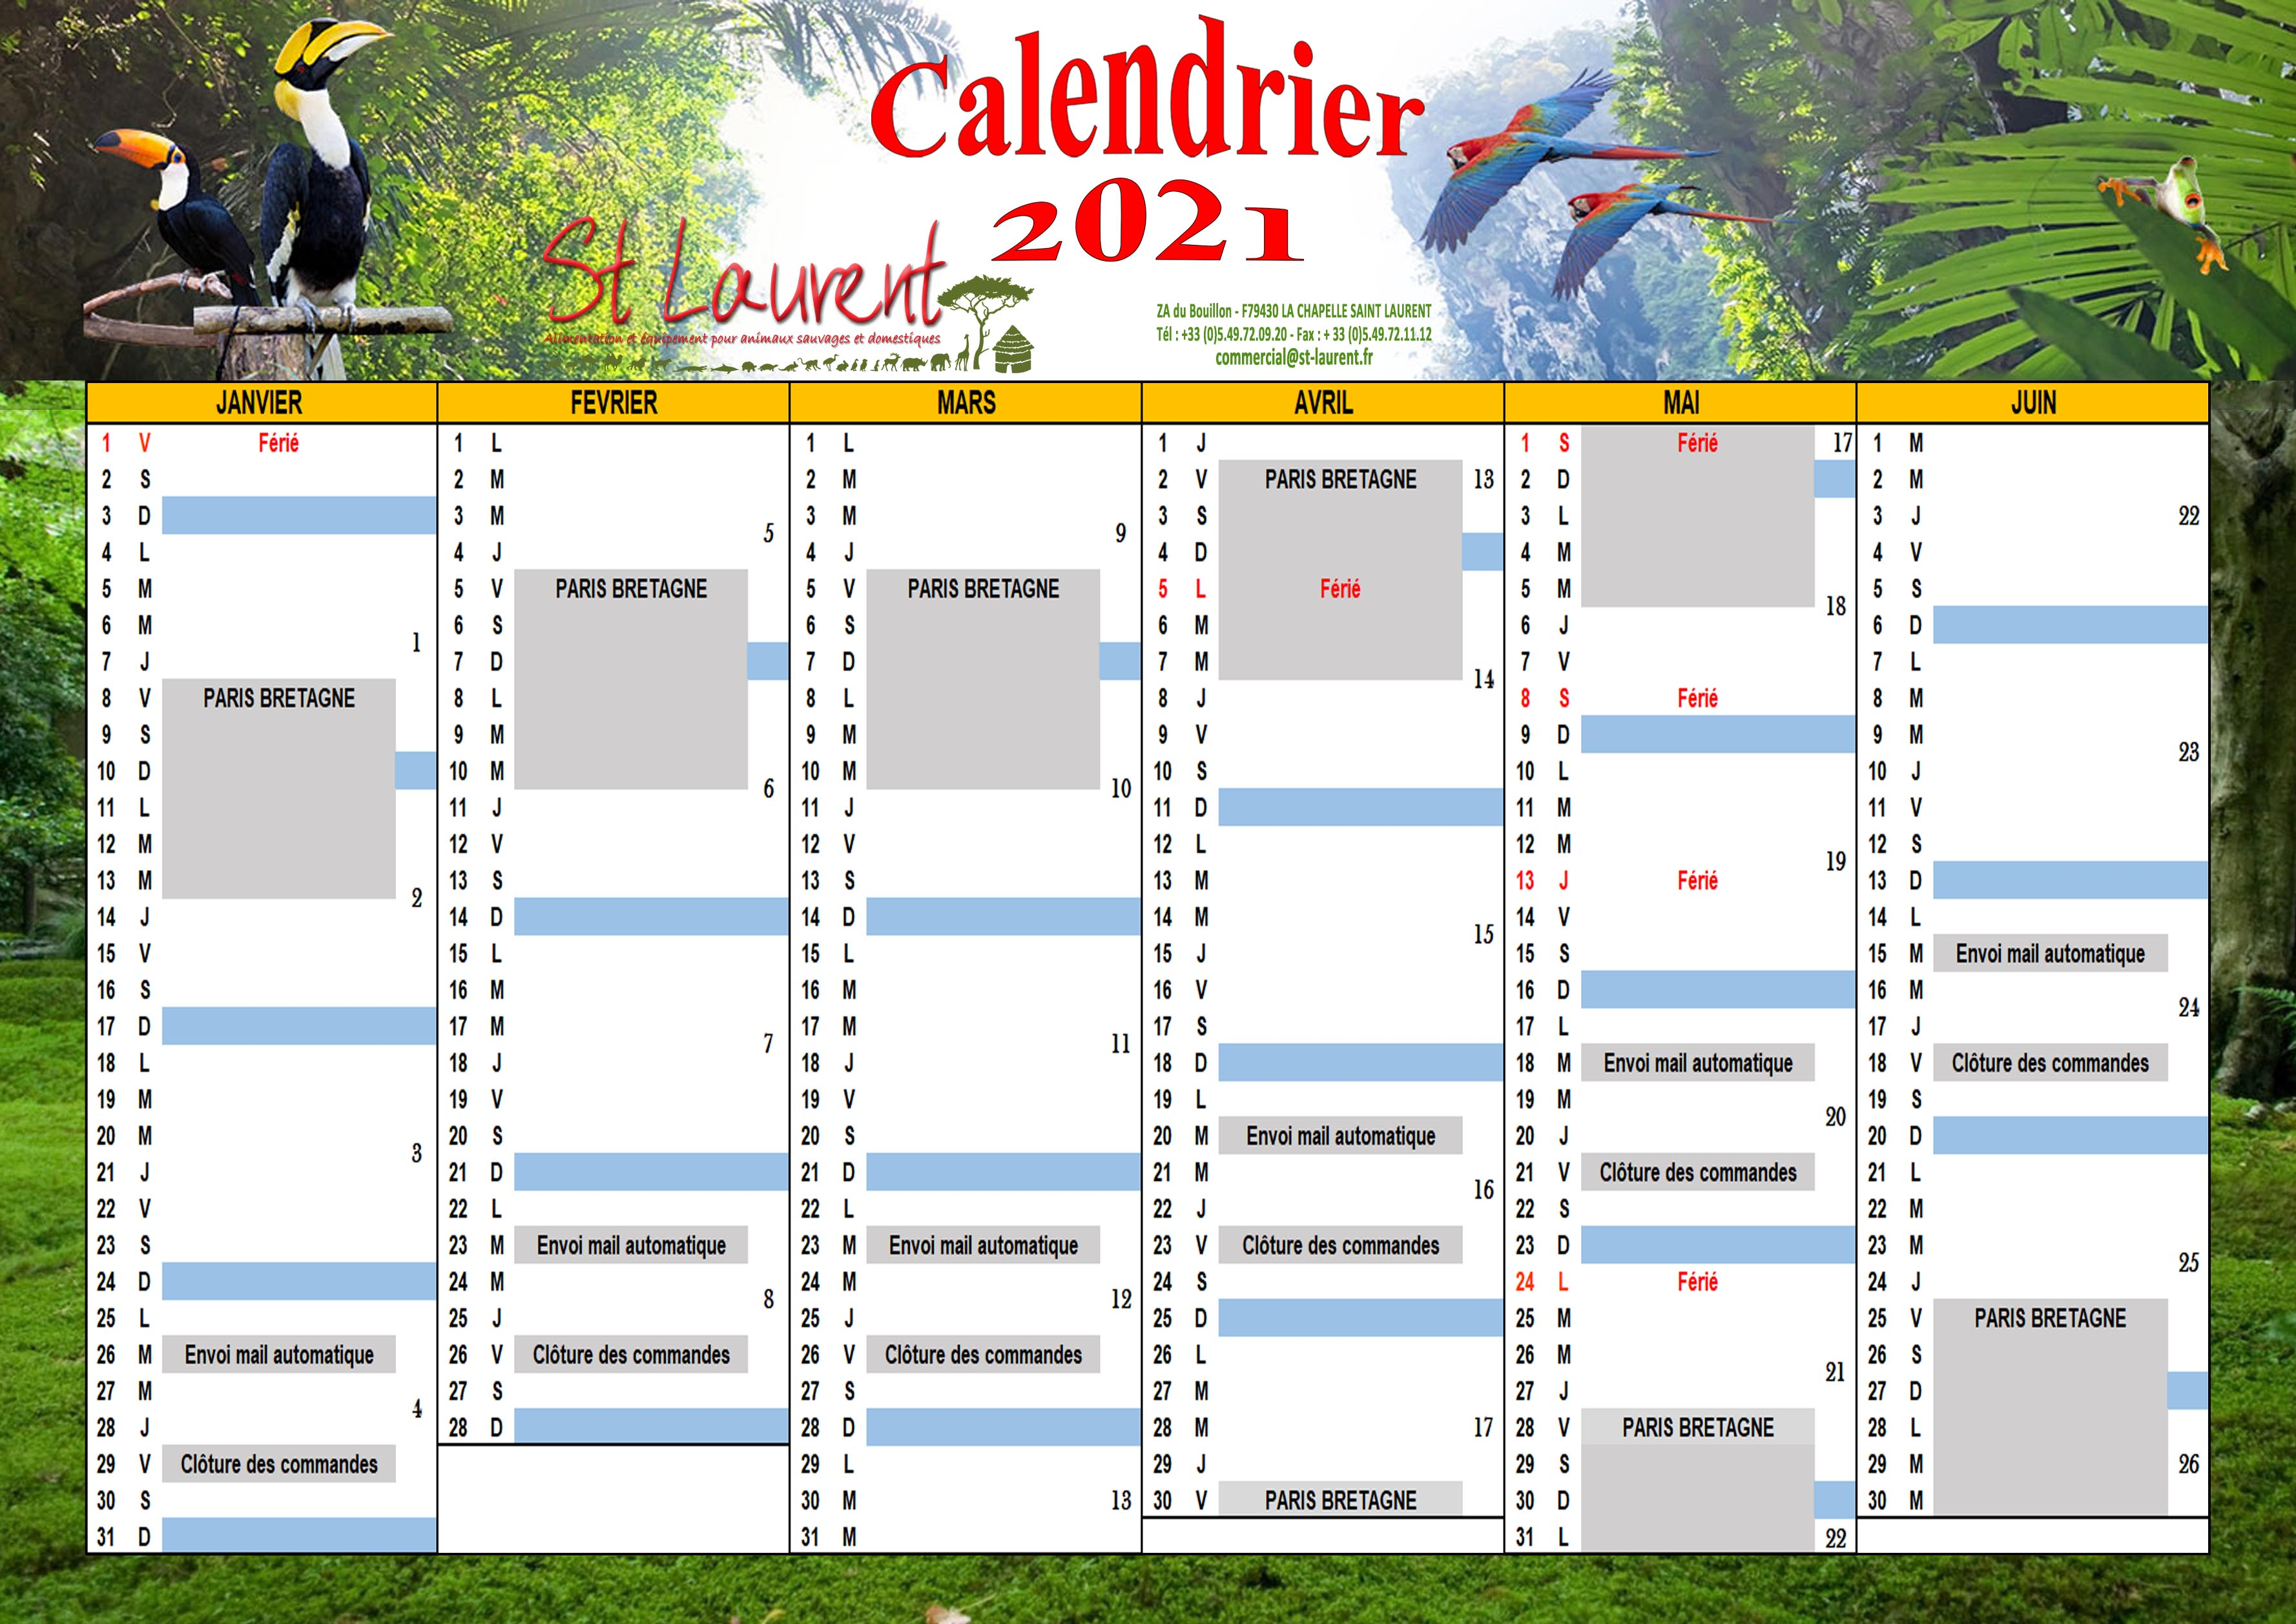 Calendrier 2021 PARIS BRETAGNE semestre